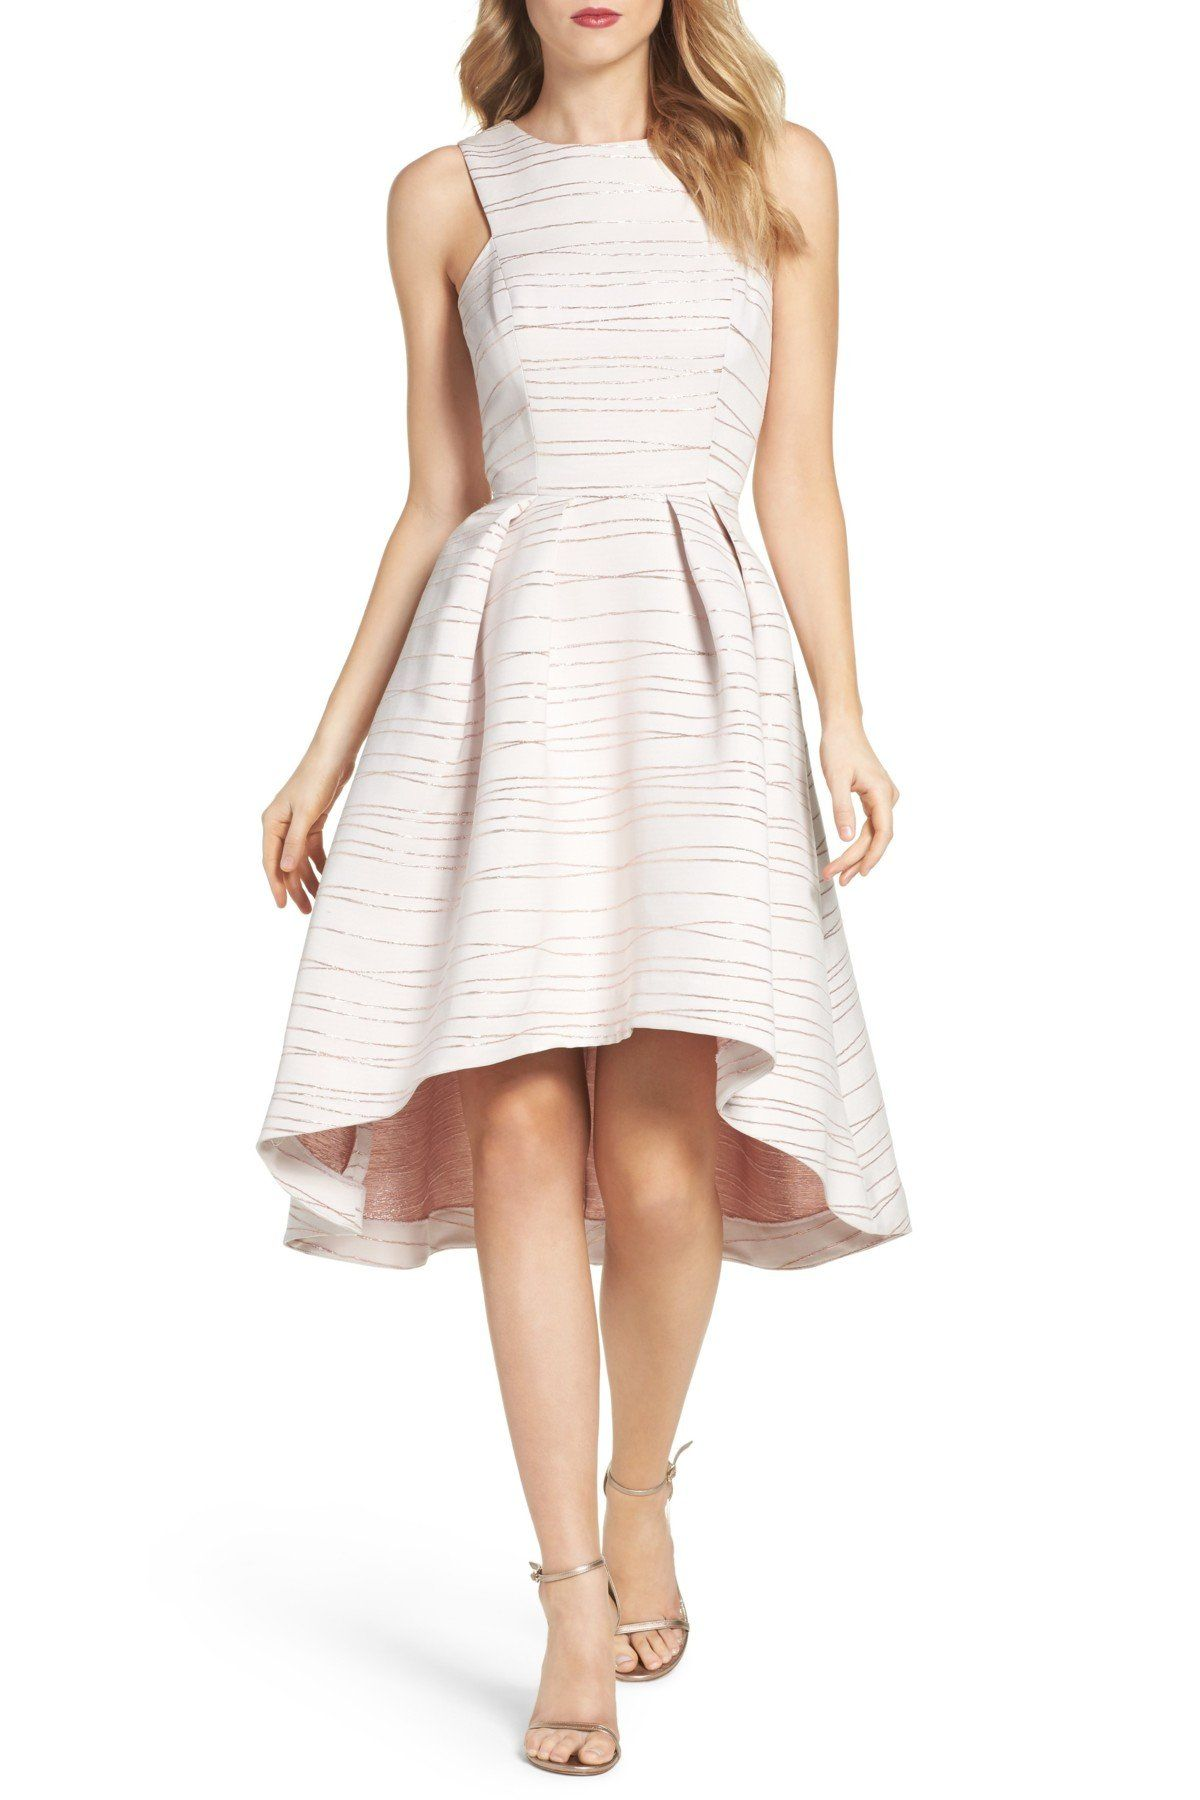 Coraline fit u flare dress products